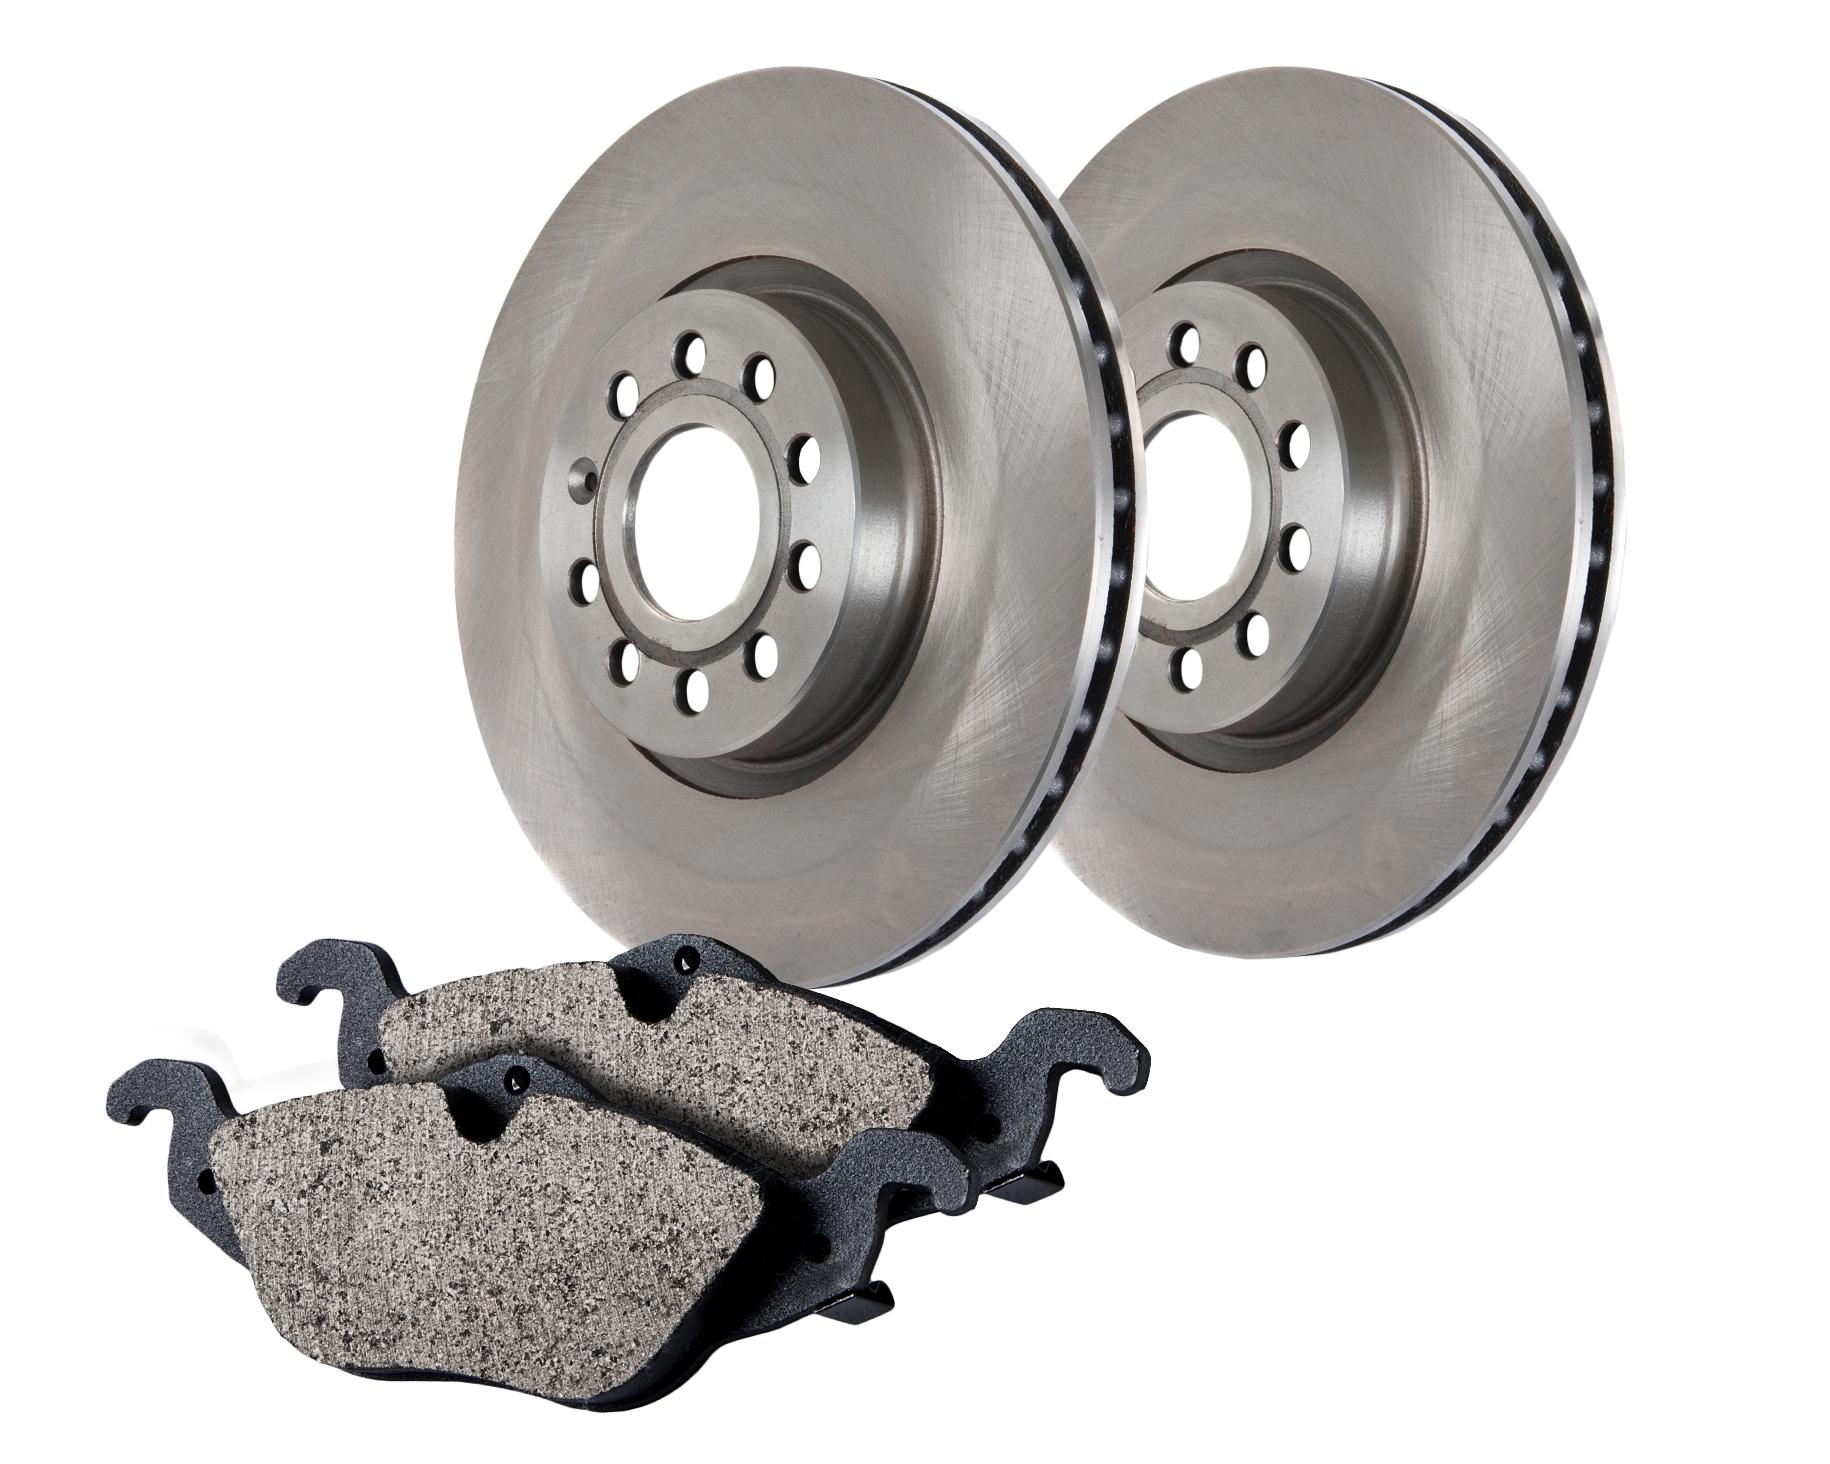 Centric Brake Parts 905.67009 Brake Rotor and Pad Kit, Premium, Semi-Metallic Pads, Iron, Natural, Dodge Durango 2004-06 / Dodge Ram 2002-05, Kit